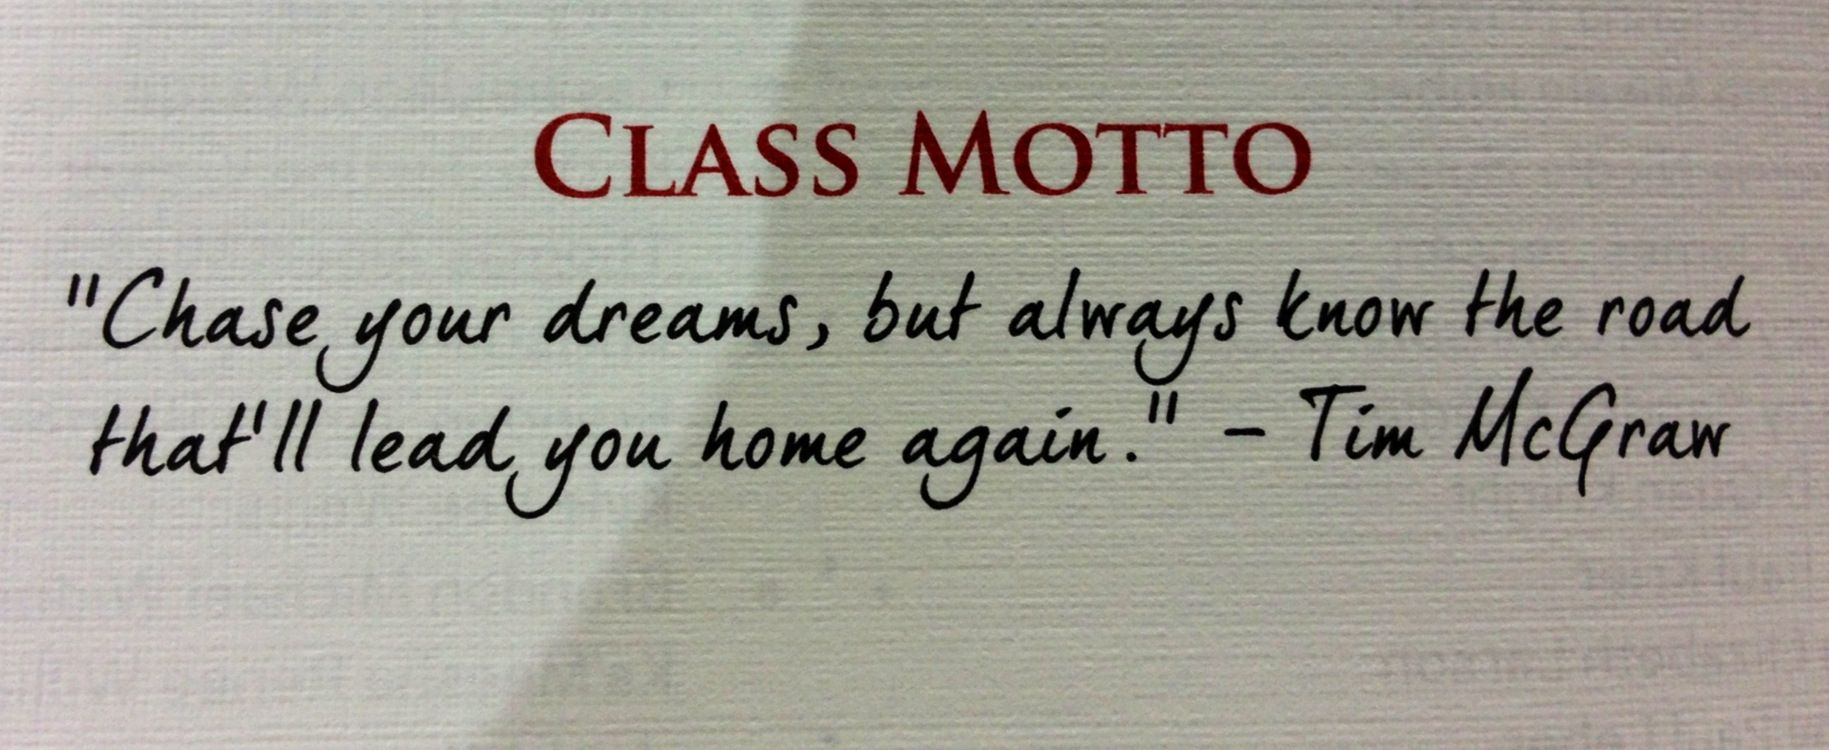 Classroom Motto Ideas ~ Class motto say what pinterest senior